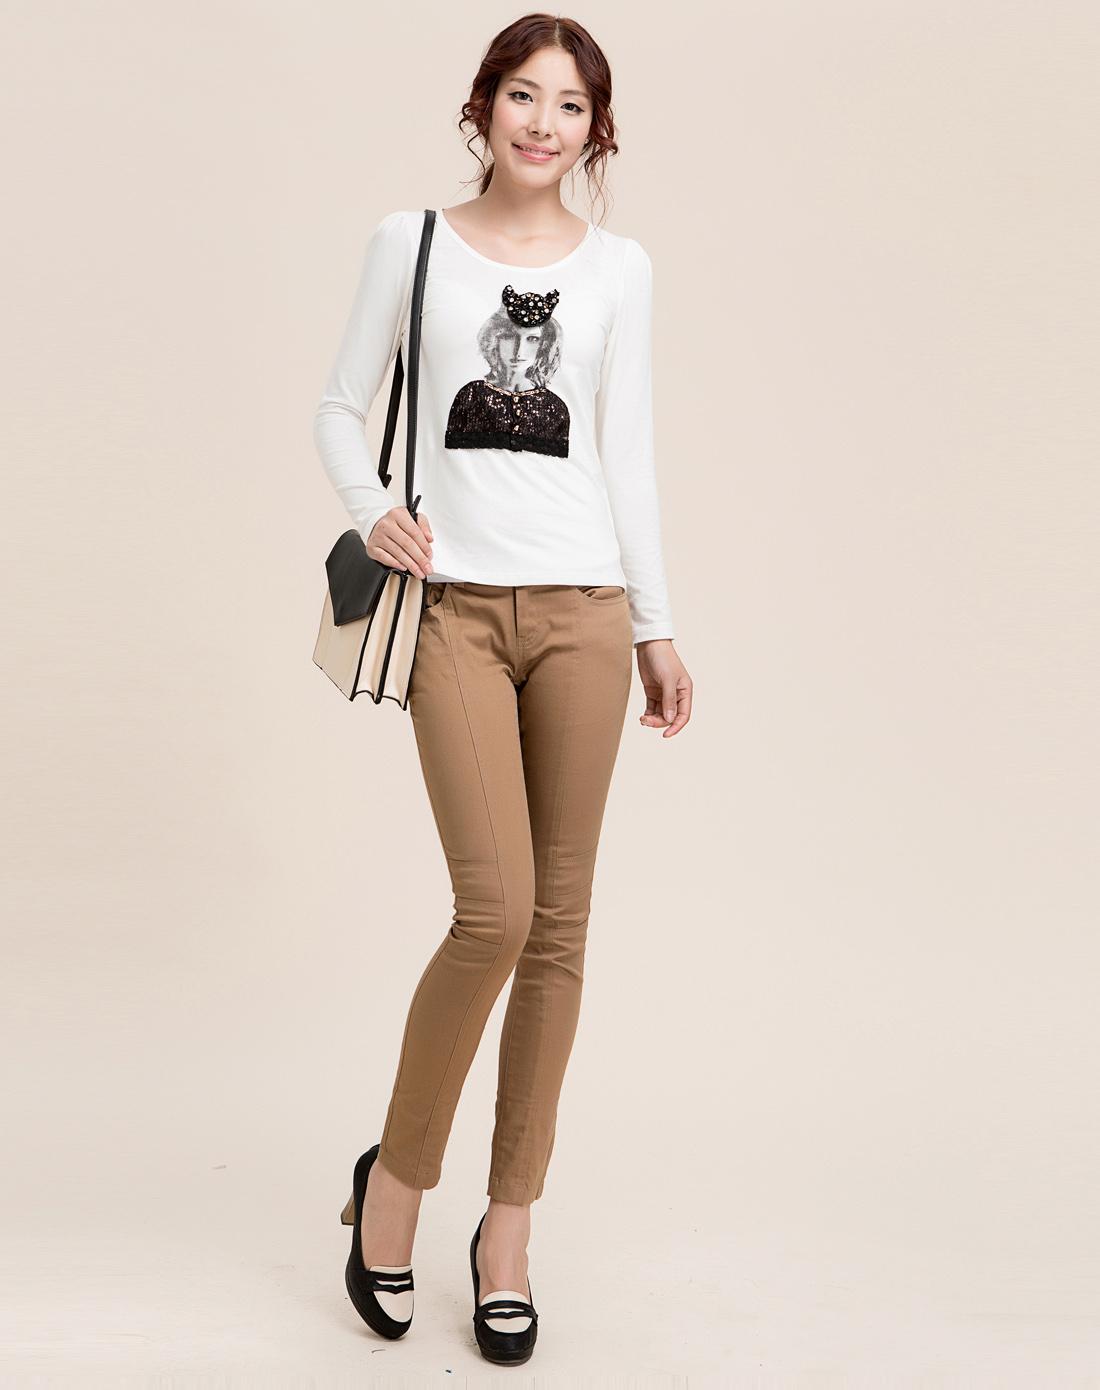 红袖hopeshow白色美女图像长袖t恤h9350723白色